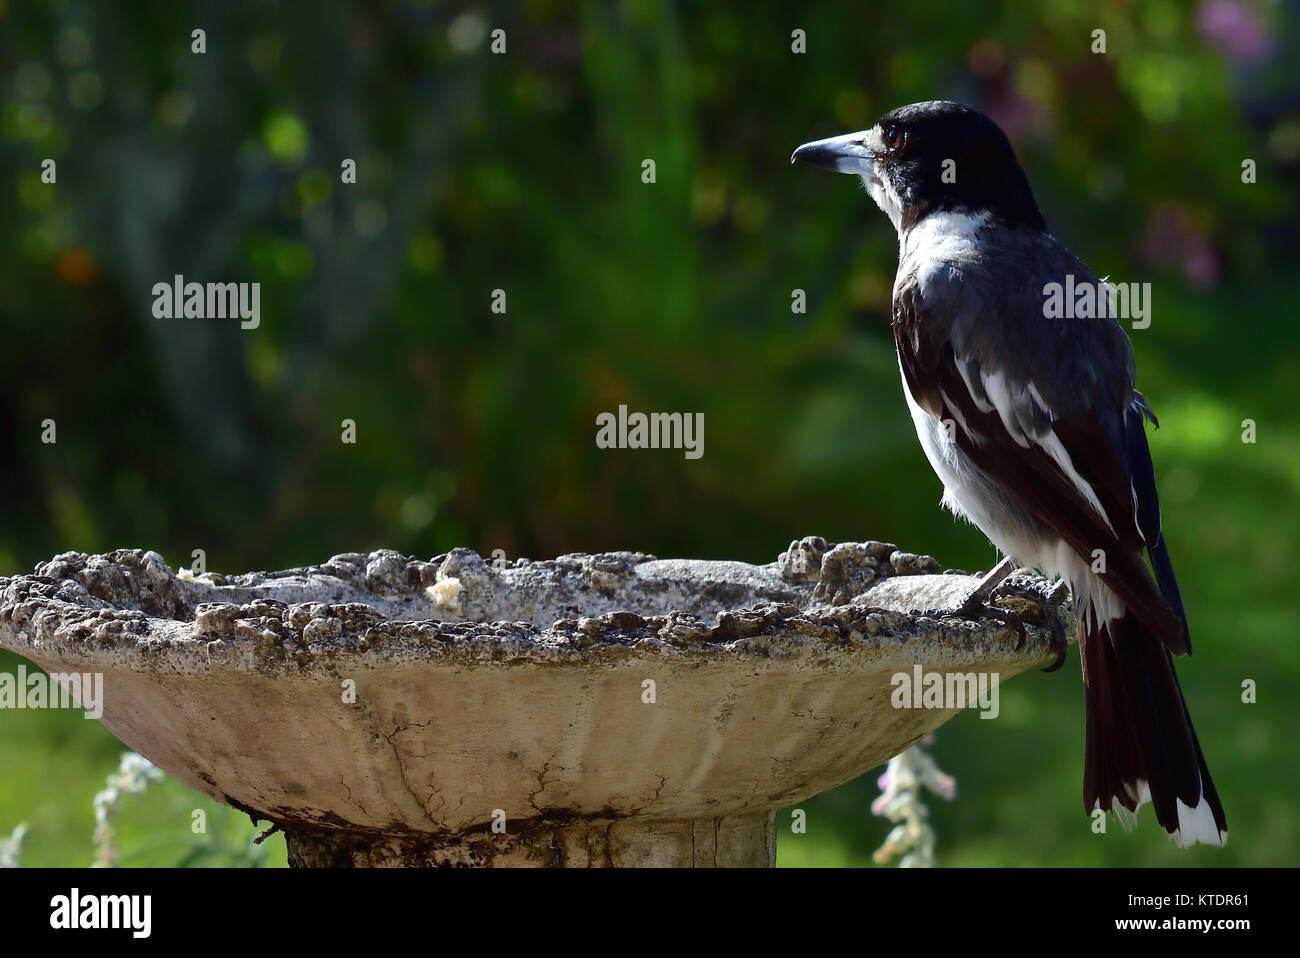 An Australian Grey Butcherbird resting on a Birdbath - Stock Image